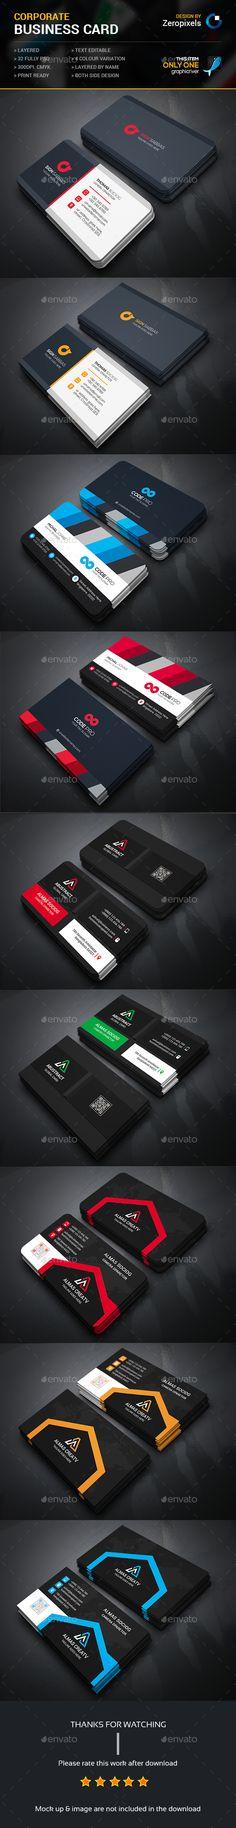 Business Card Template PSD Bundle. Download here: http://graphicriver.net/item/business-card-bundle/15773718?ref=ksioks